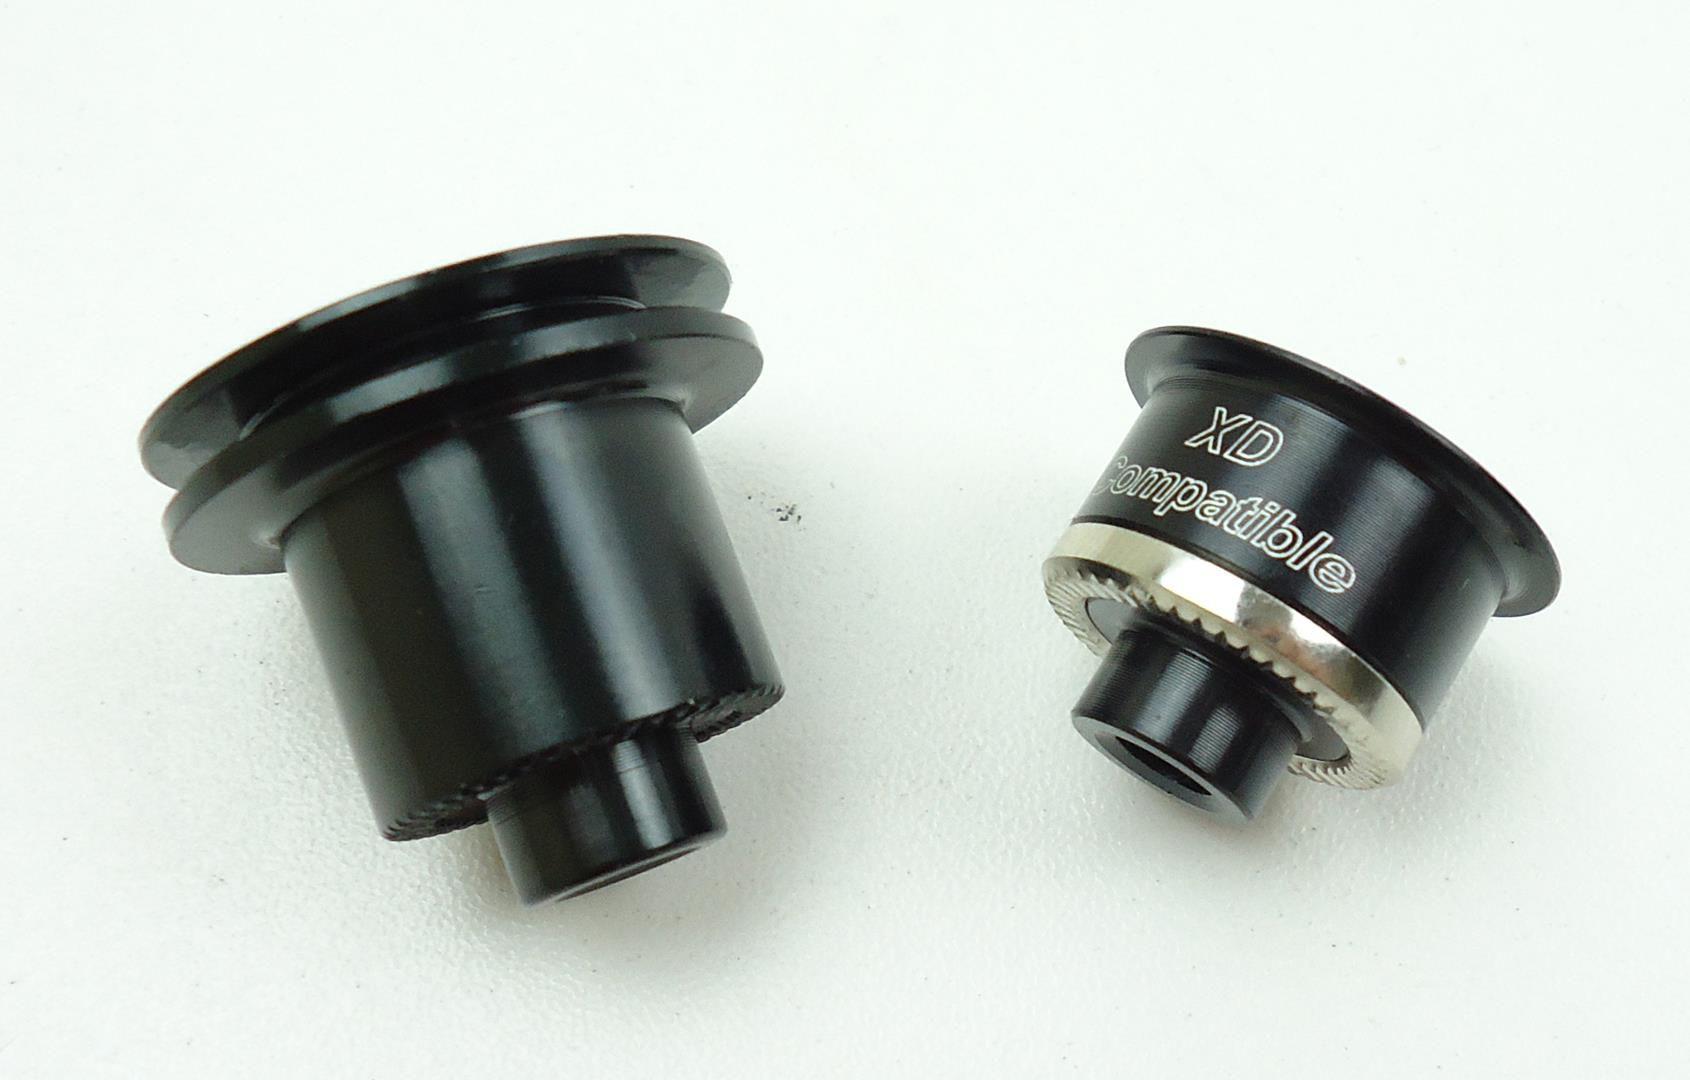 End Caps XD Para Cubo DT Swiss 240s 350 135x10mm Sram 11v Xx1 X01 X1 Gx Eagle 12v